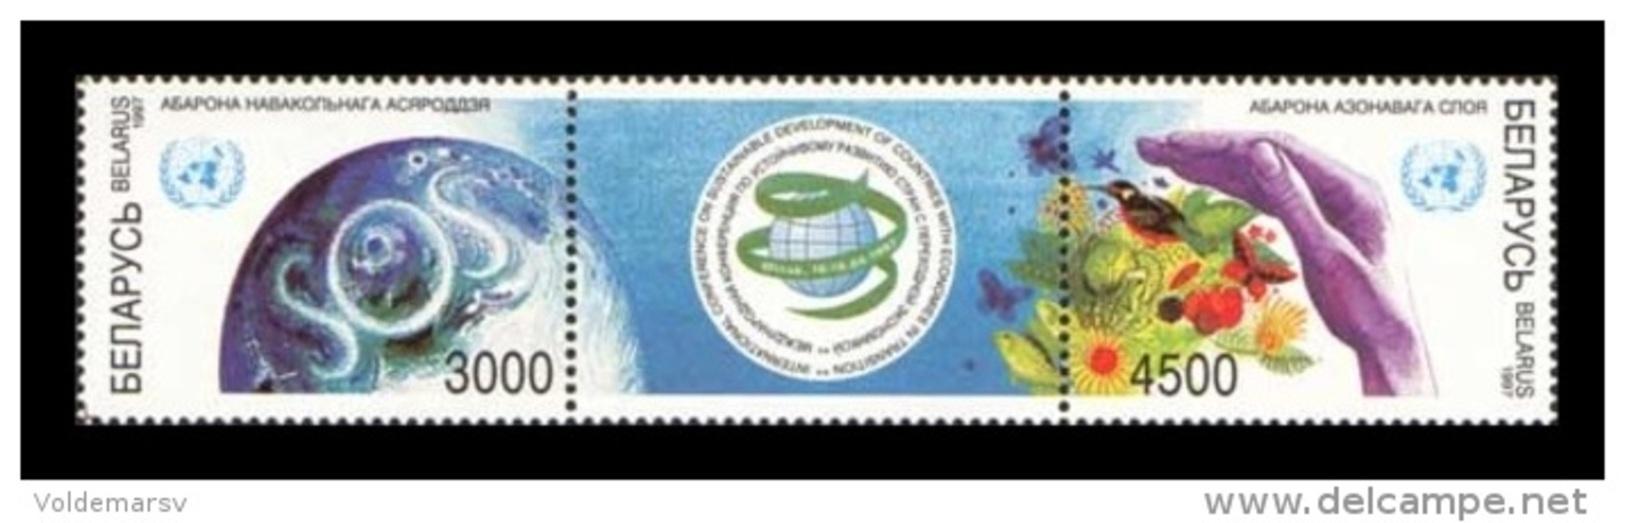 Belarus 1997 Mih. 222/23 Ozone Layer Protection MNH ** - Belarus